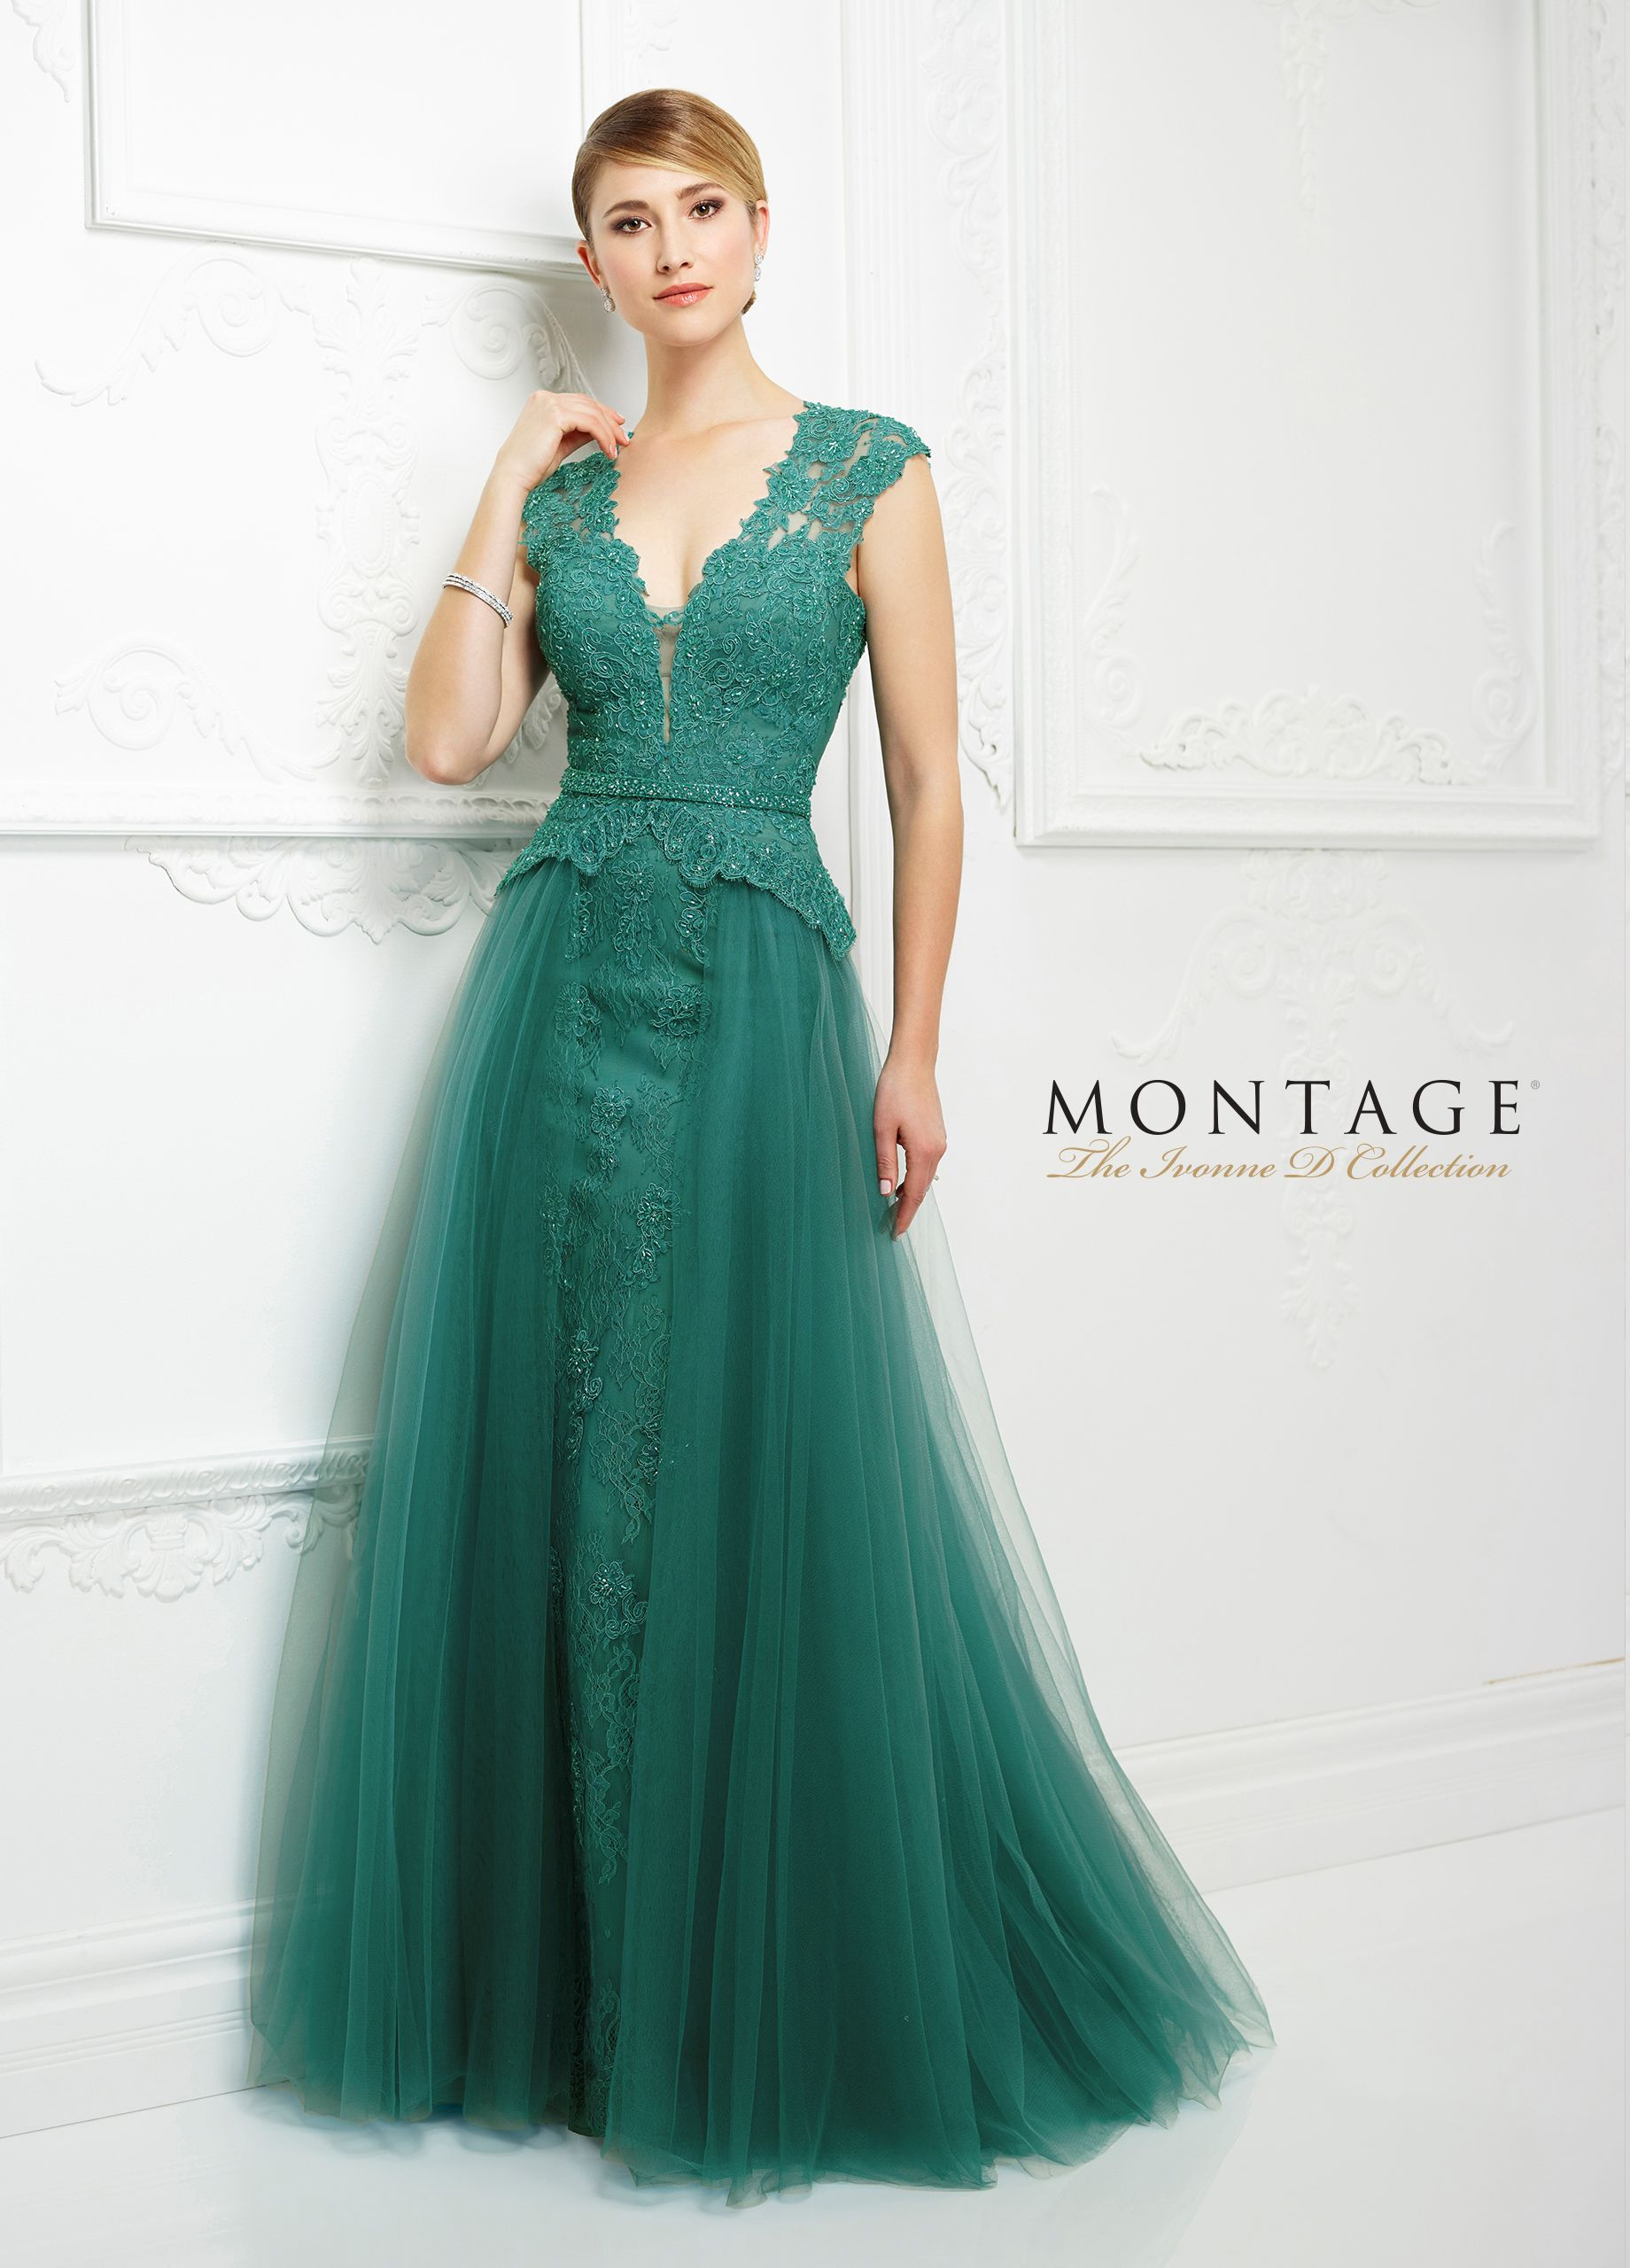 Couture Ivonne D Mother of the Bride Dresses 2019 for Mon Cheri ... 8508f7ea9